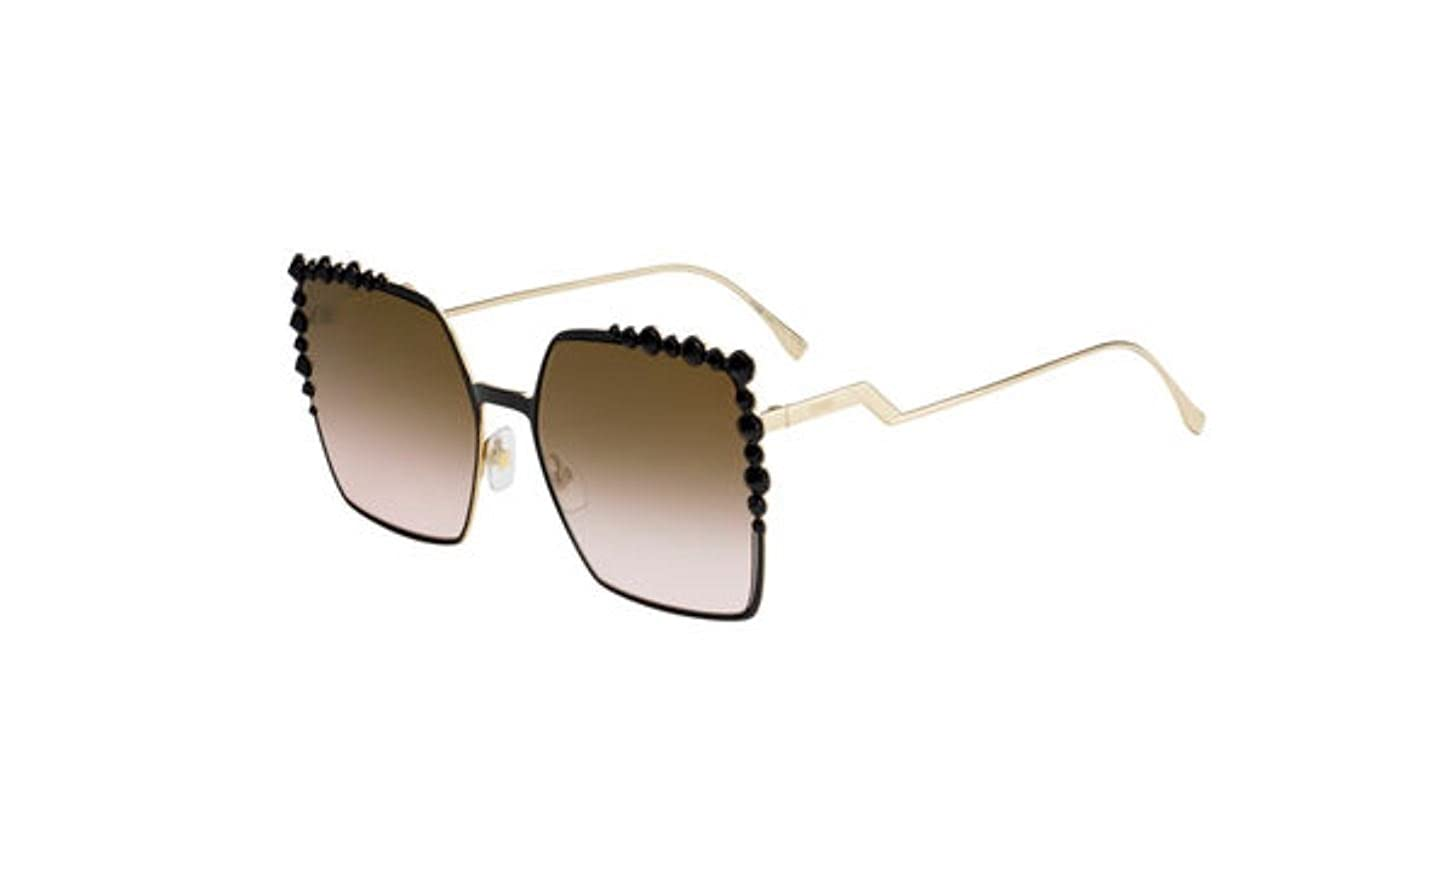 3f8cc3ebb2 Amazon.com  New Fendi FF 0259 S 205 53 Black Sunglasses  Clothing